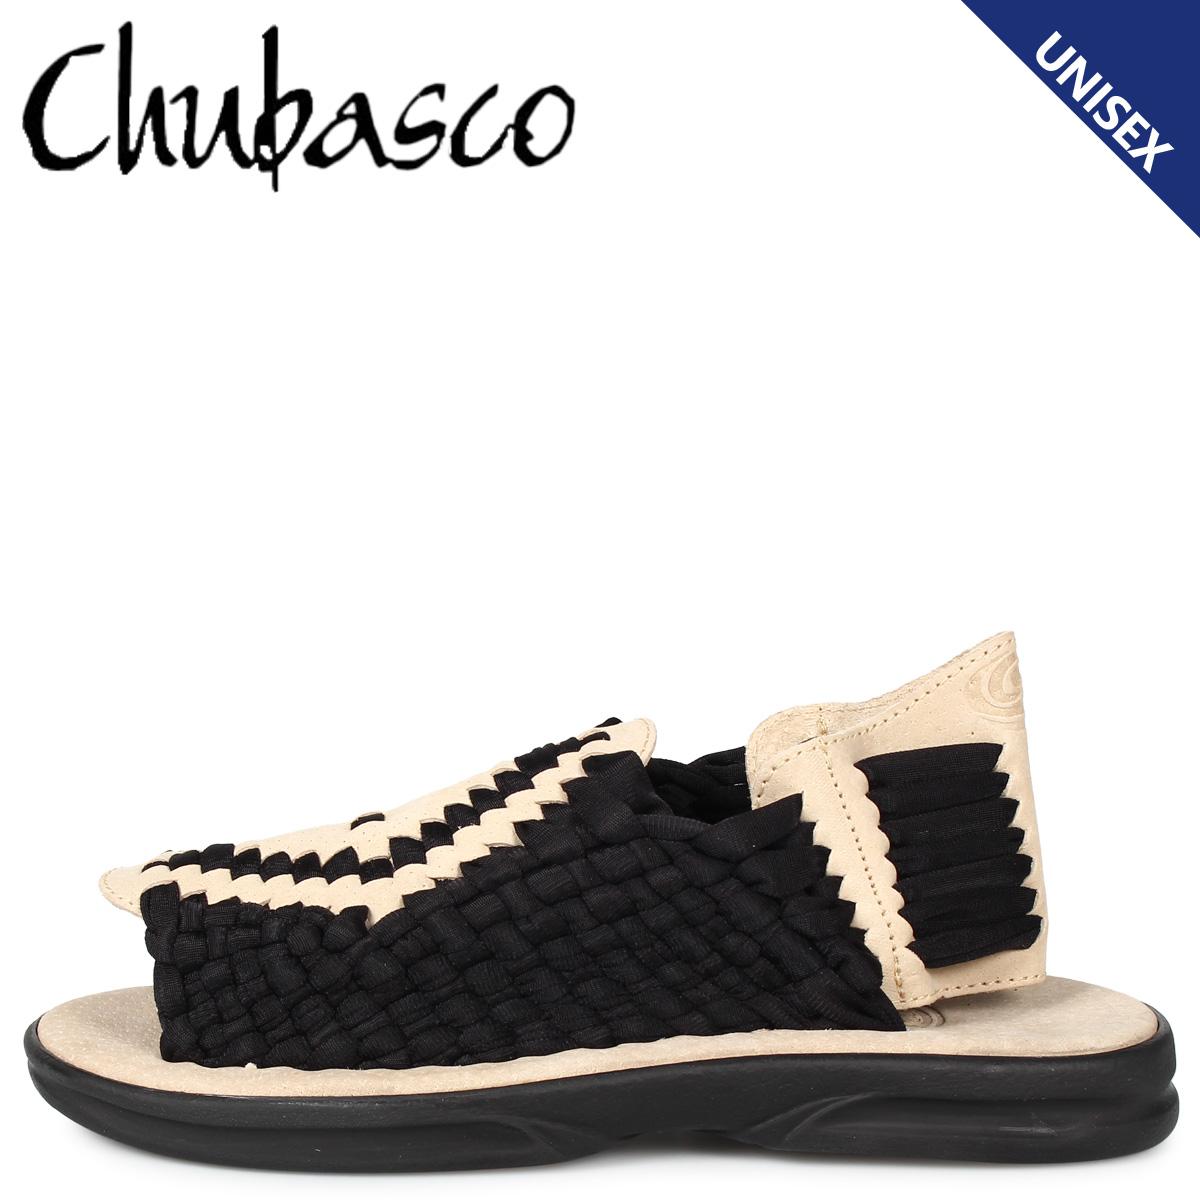 CHUBASCO チュバスコ アズテック サンダル スポーツサンダル メンズ レディース AZTEC ブラック 黒 A00061